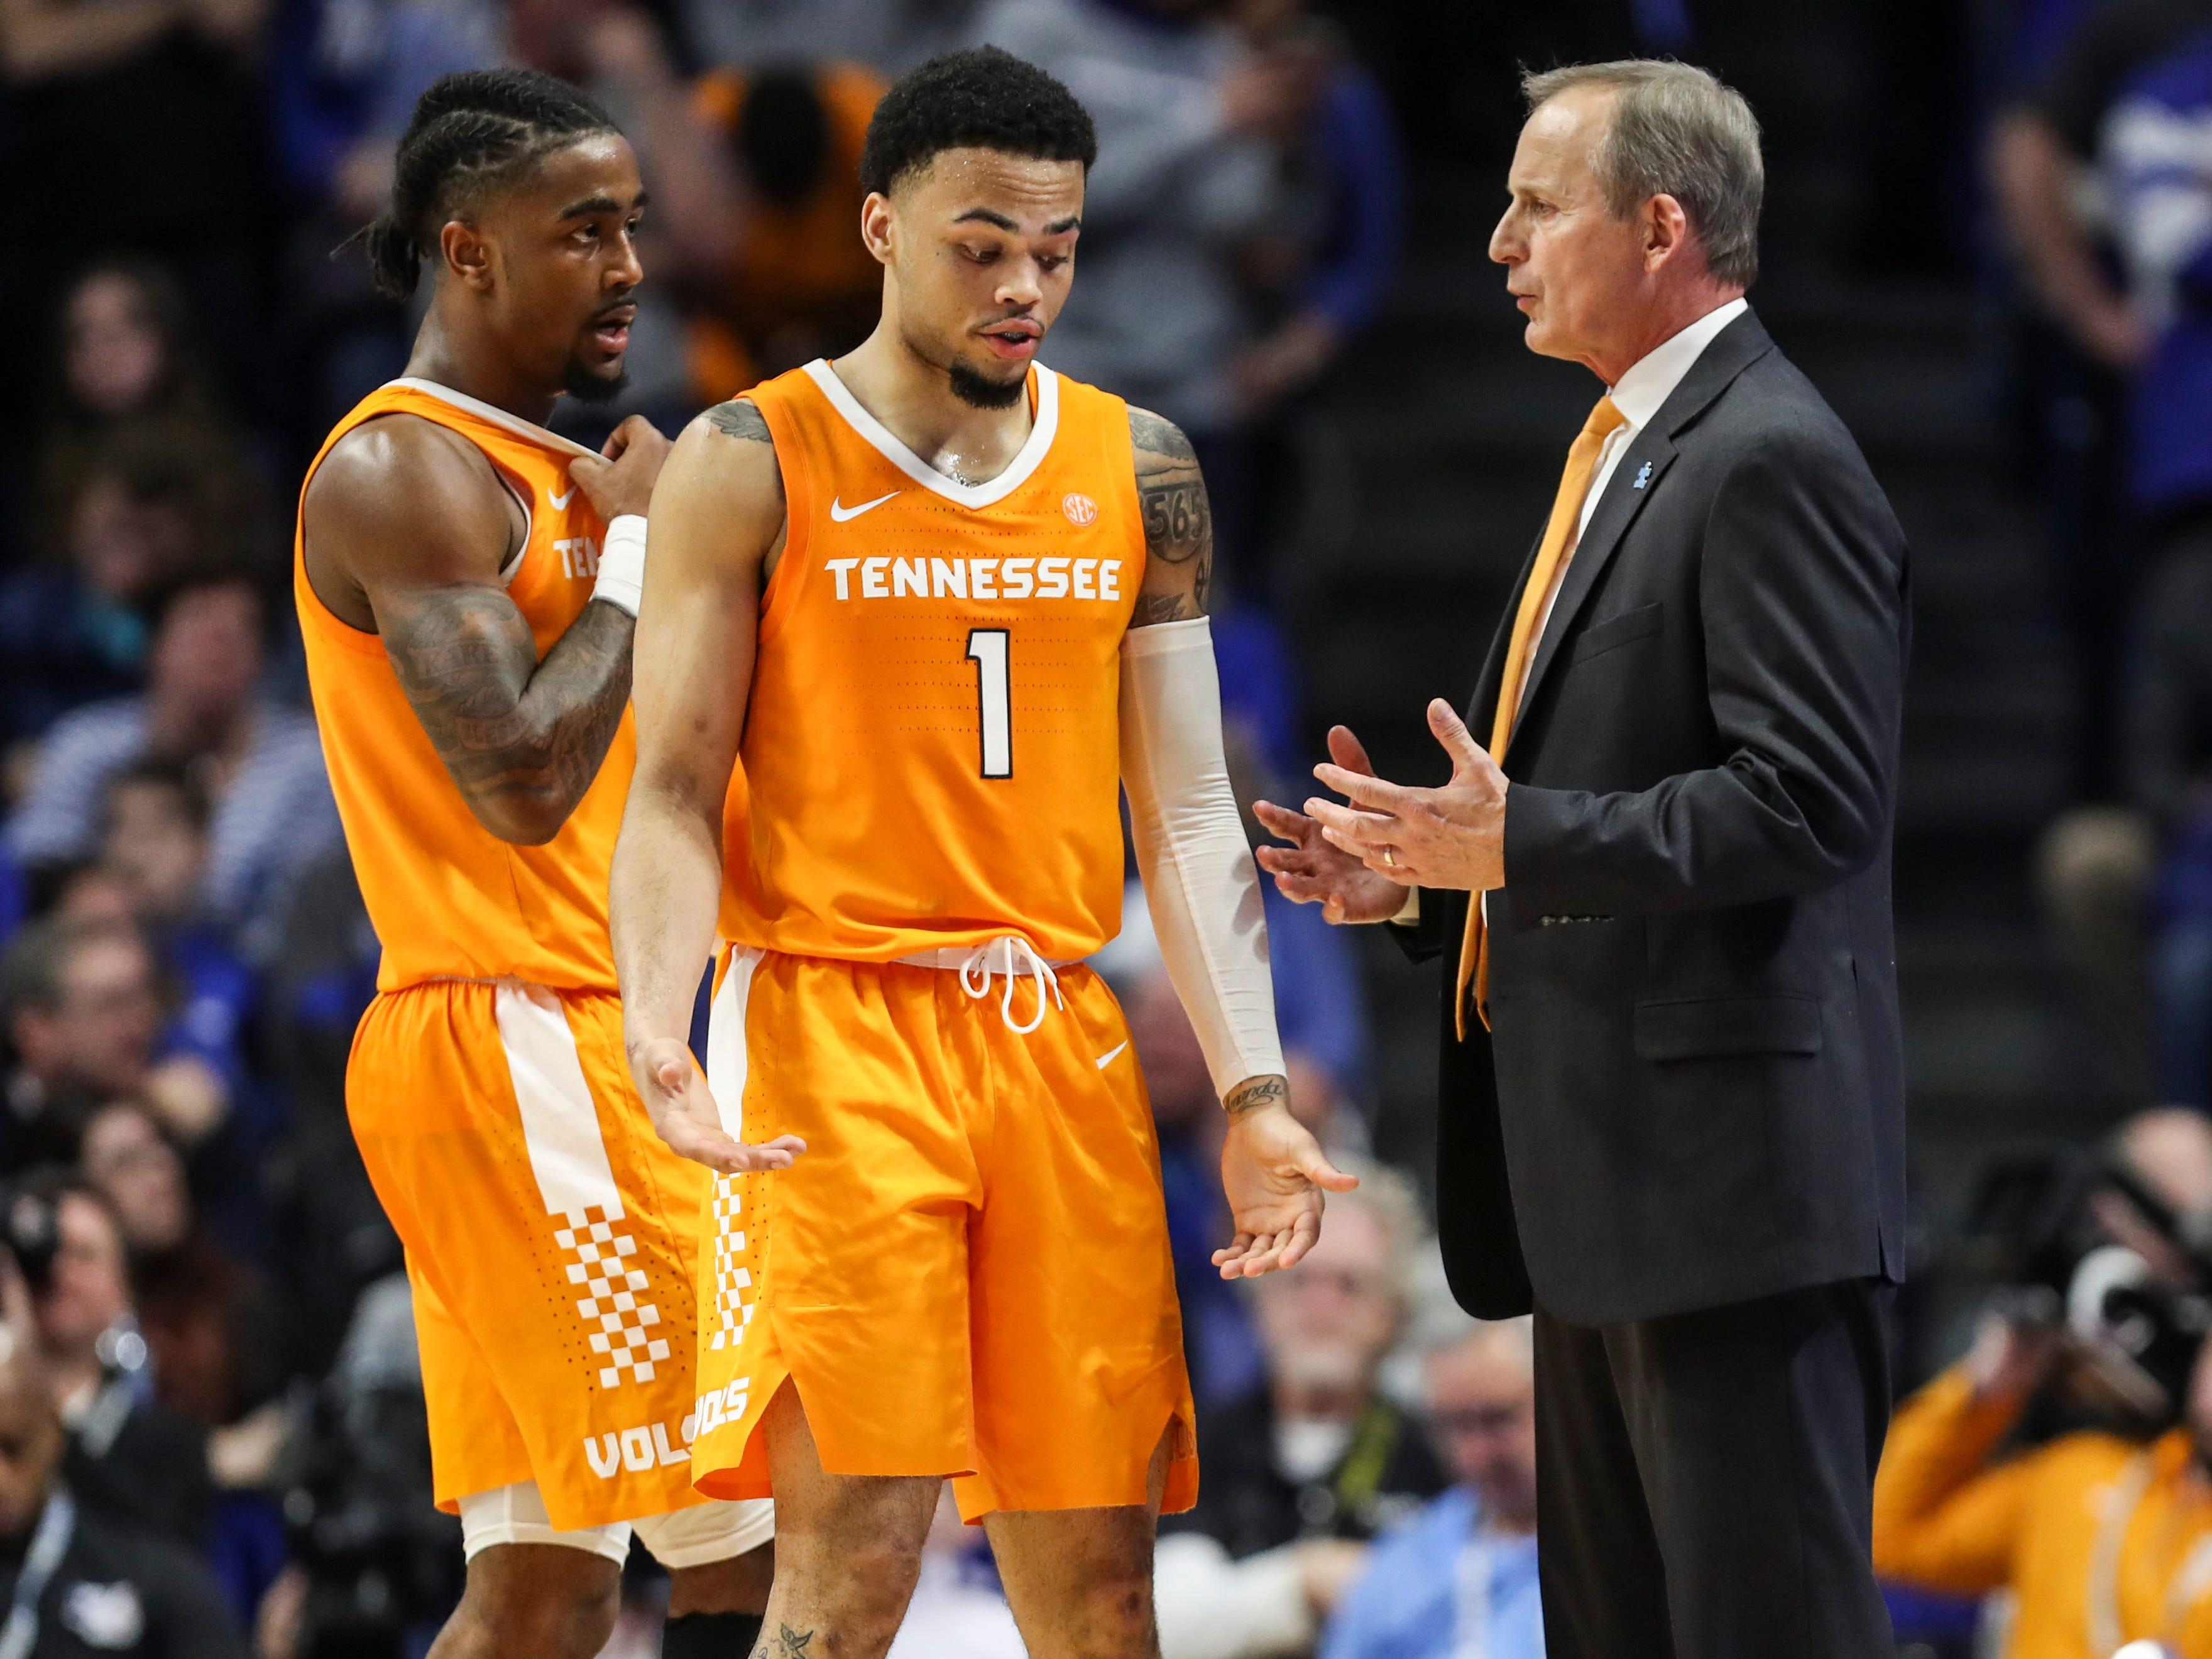 UT Vols basketball drops in polls after Kentucky loss